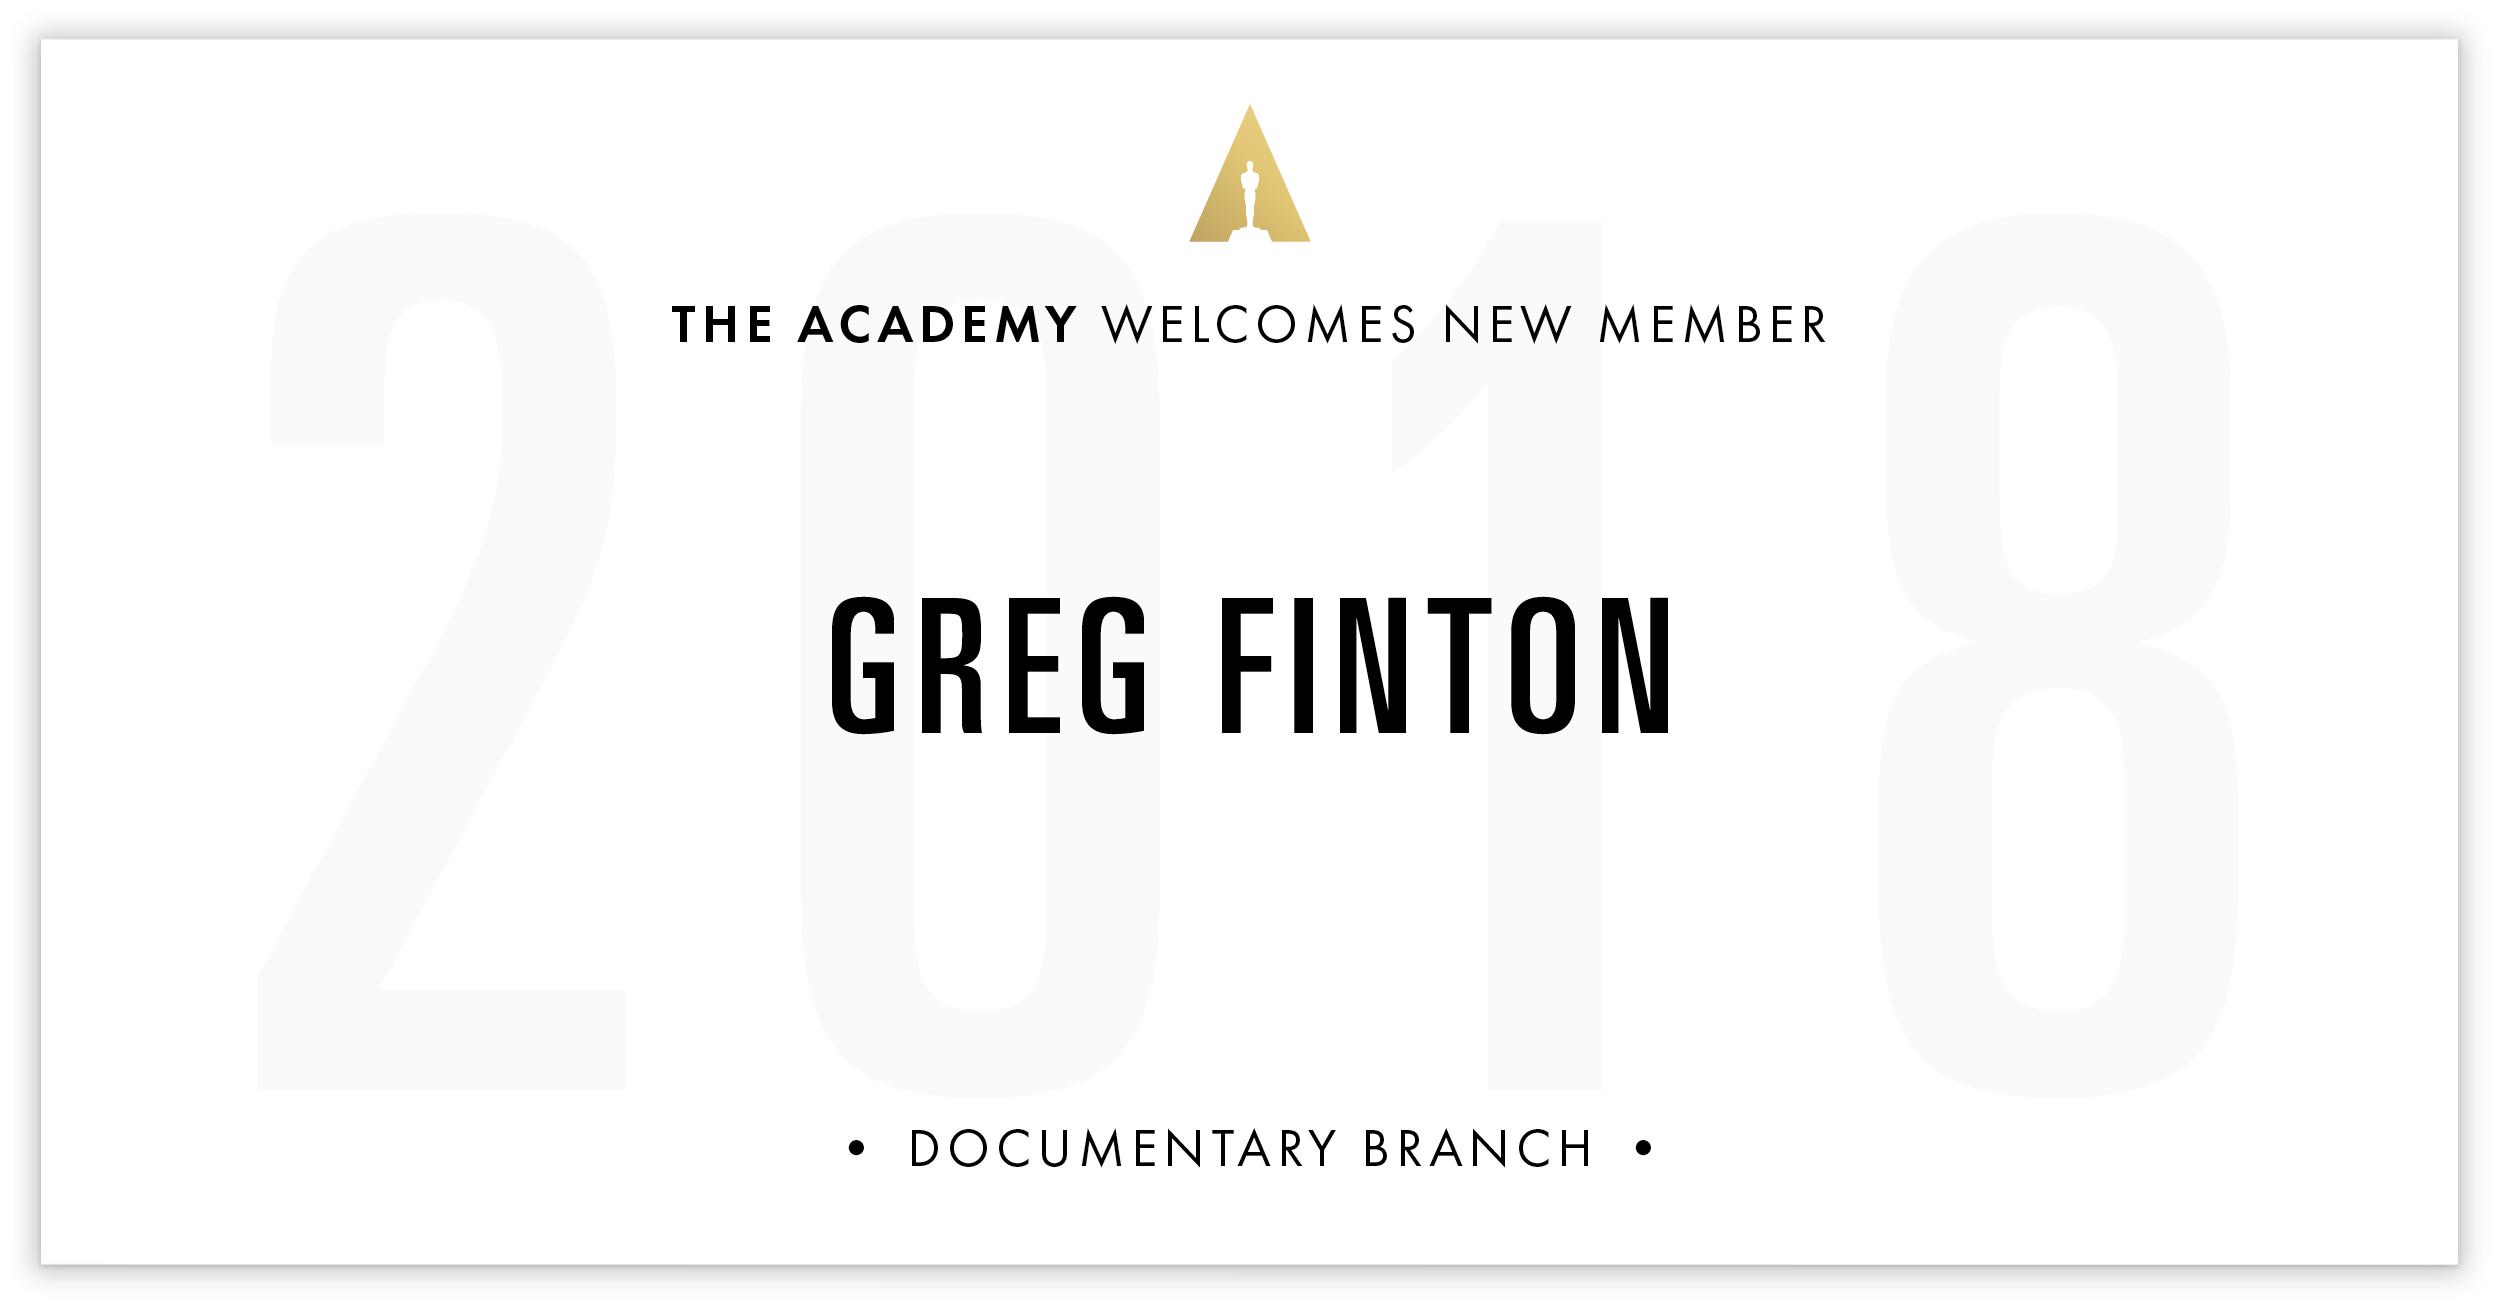 Greg Finton is invited!